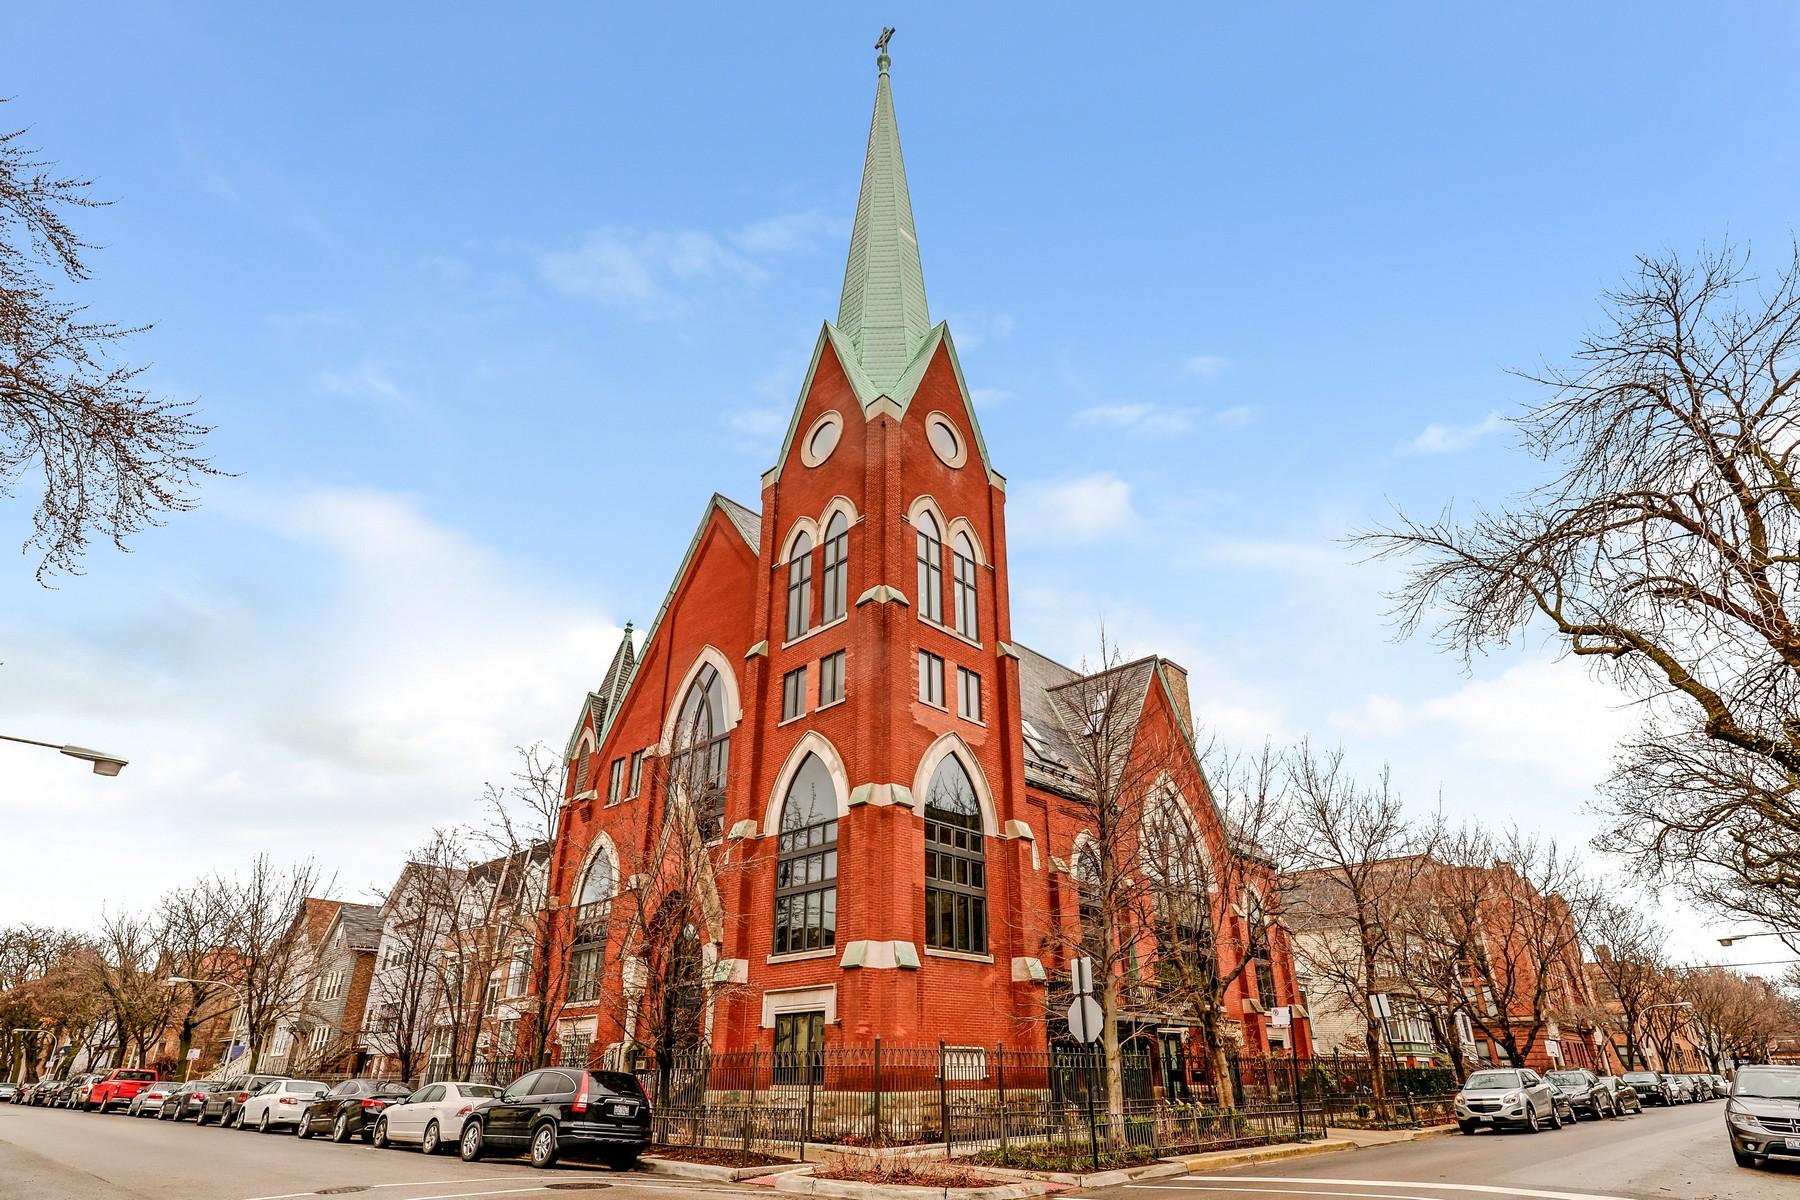 Condominium for Sale at Unique Historic Cathedral Condo in Lakeview 3101 N Seminary Avenue Unit D Chicago, Illinois 60657 United States